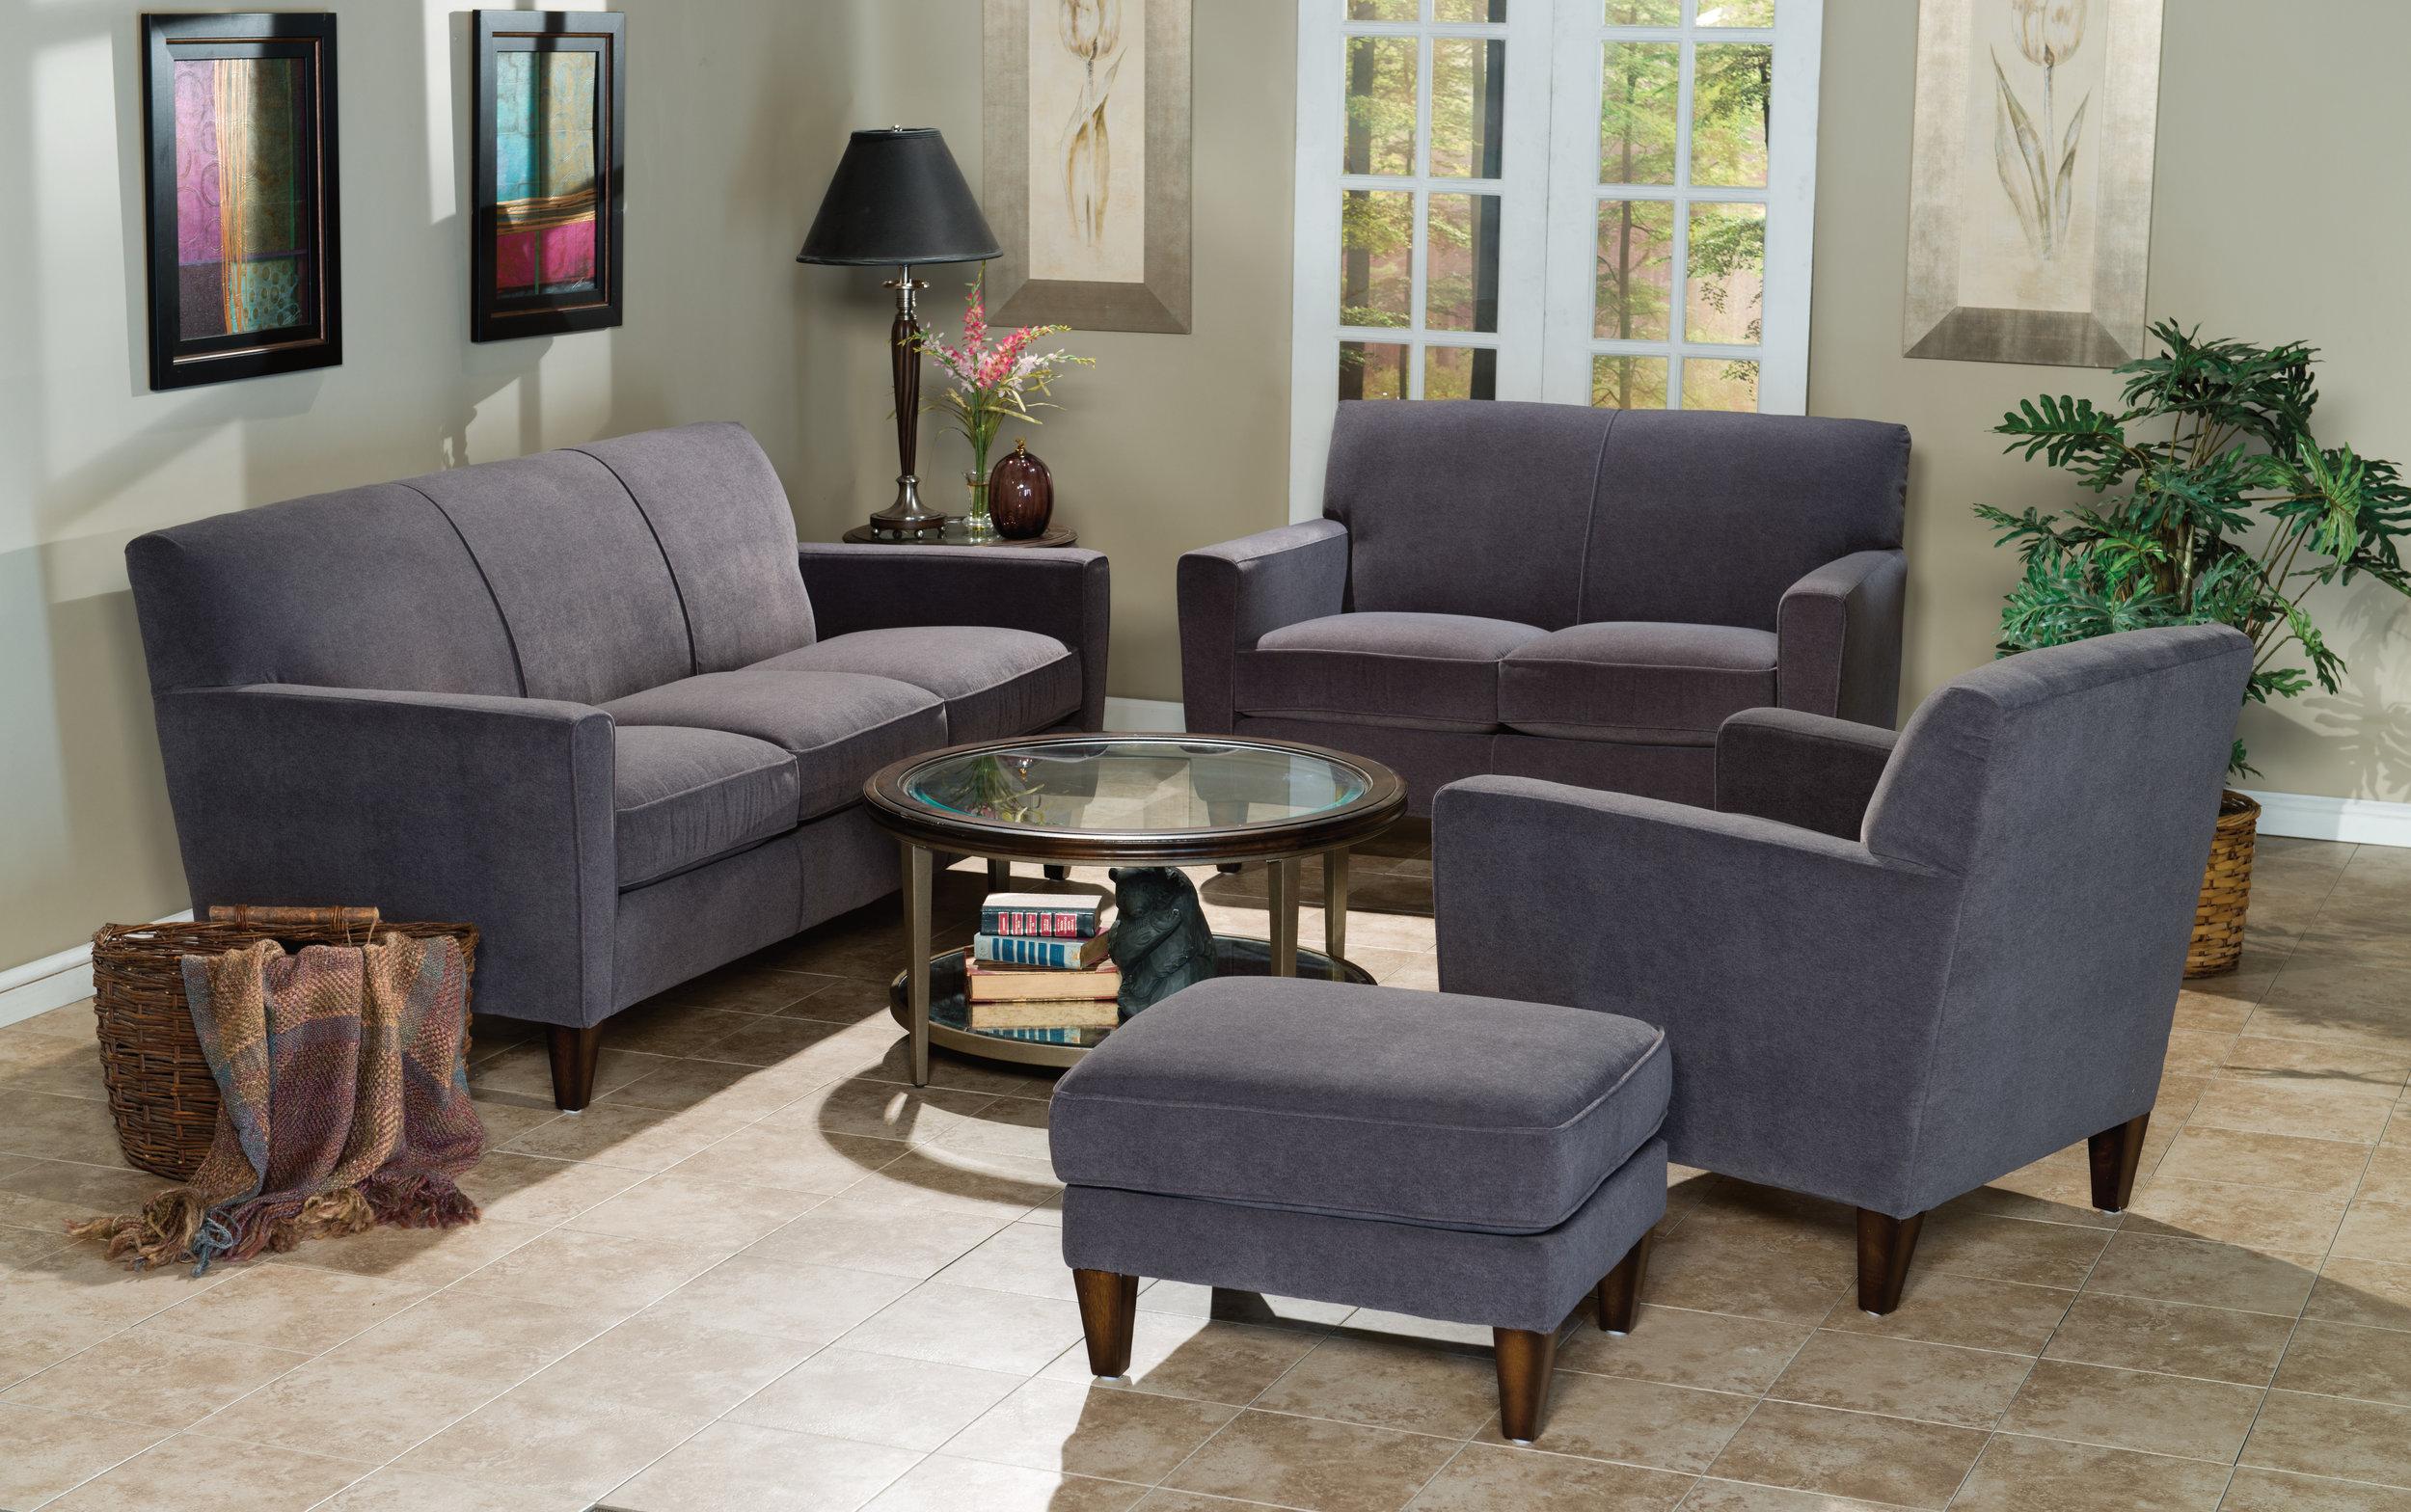 FX Digby sofa pic.jpg